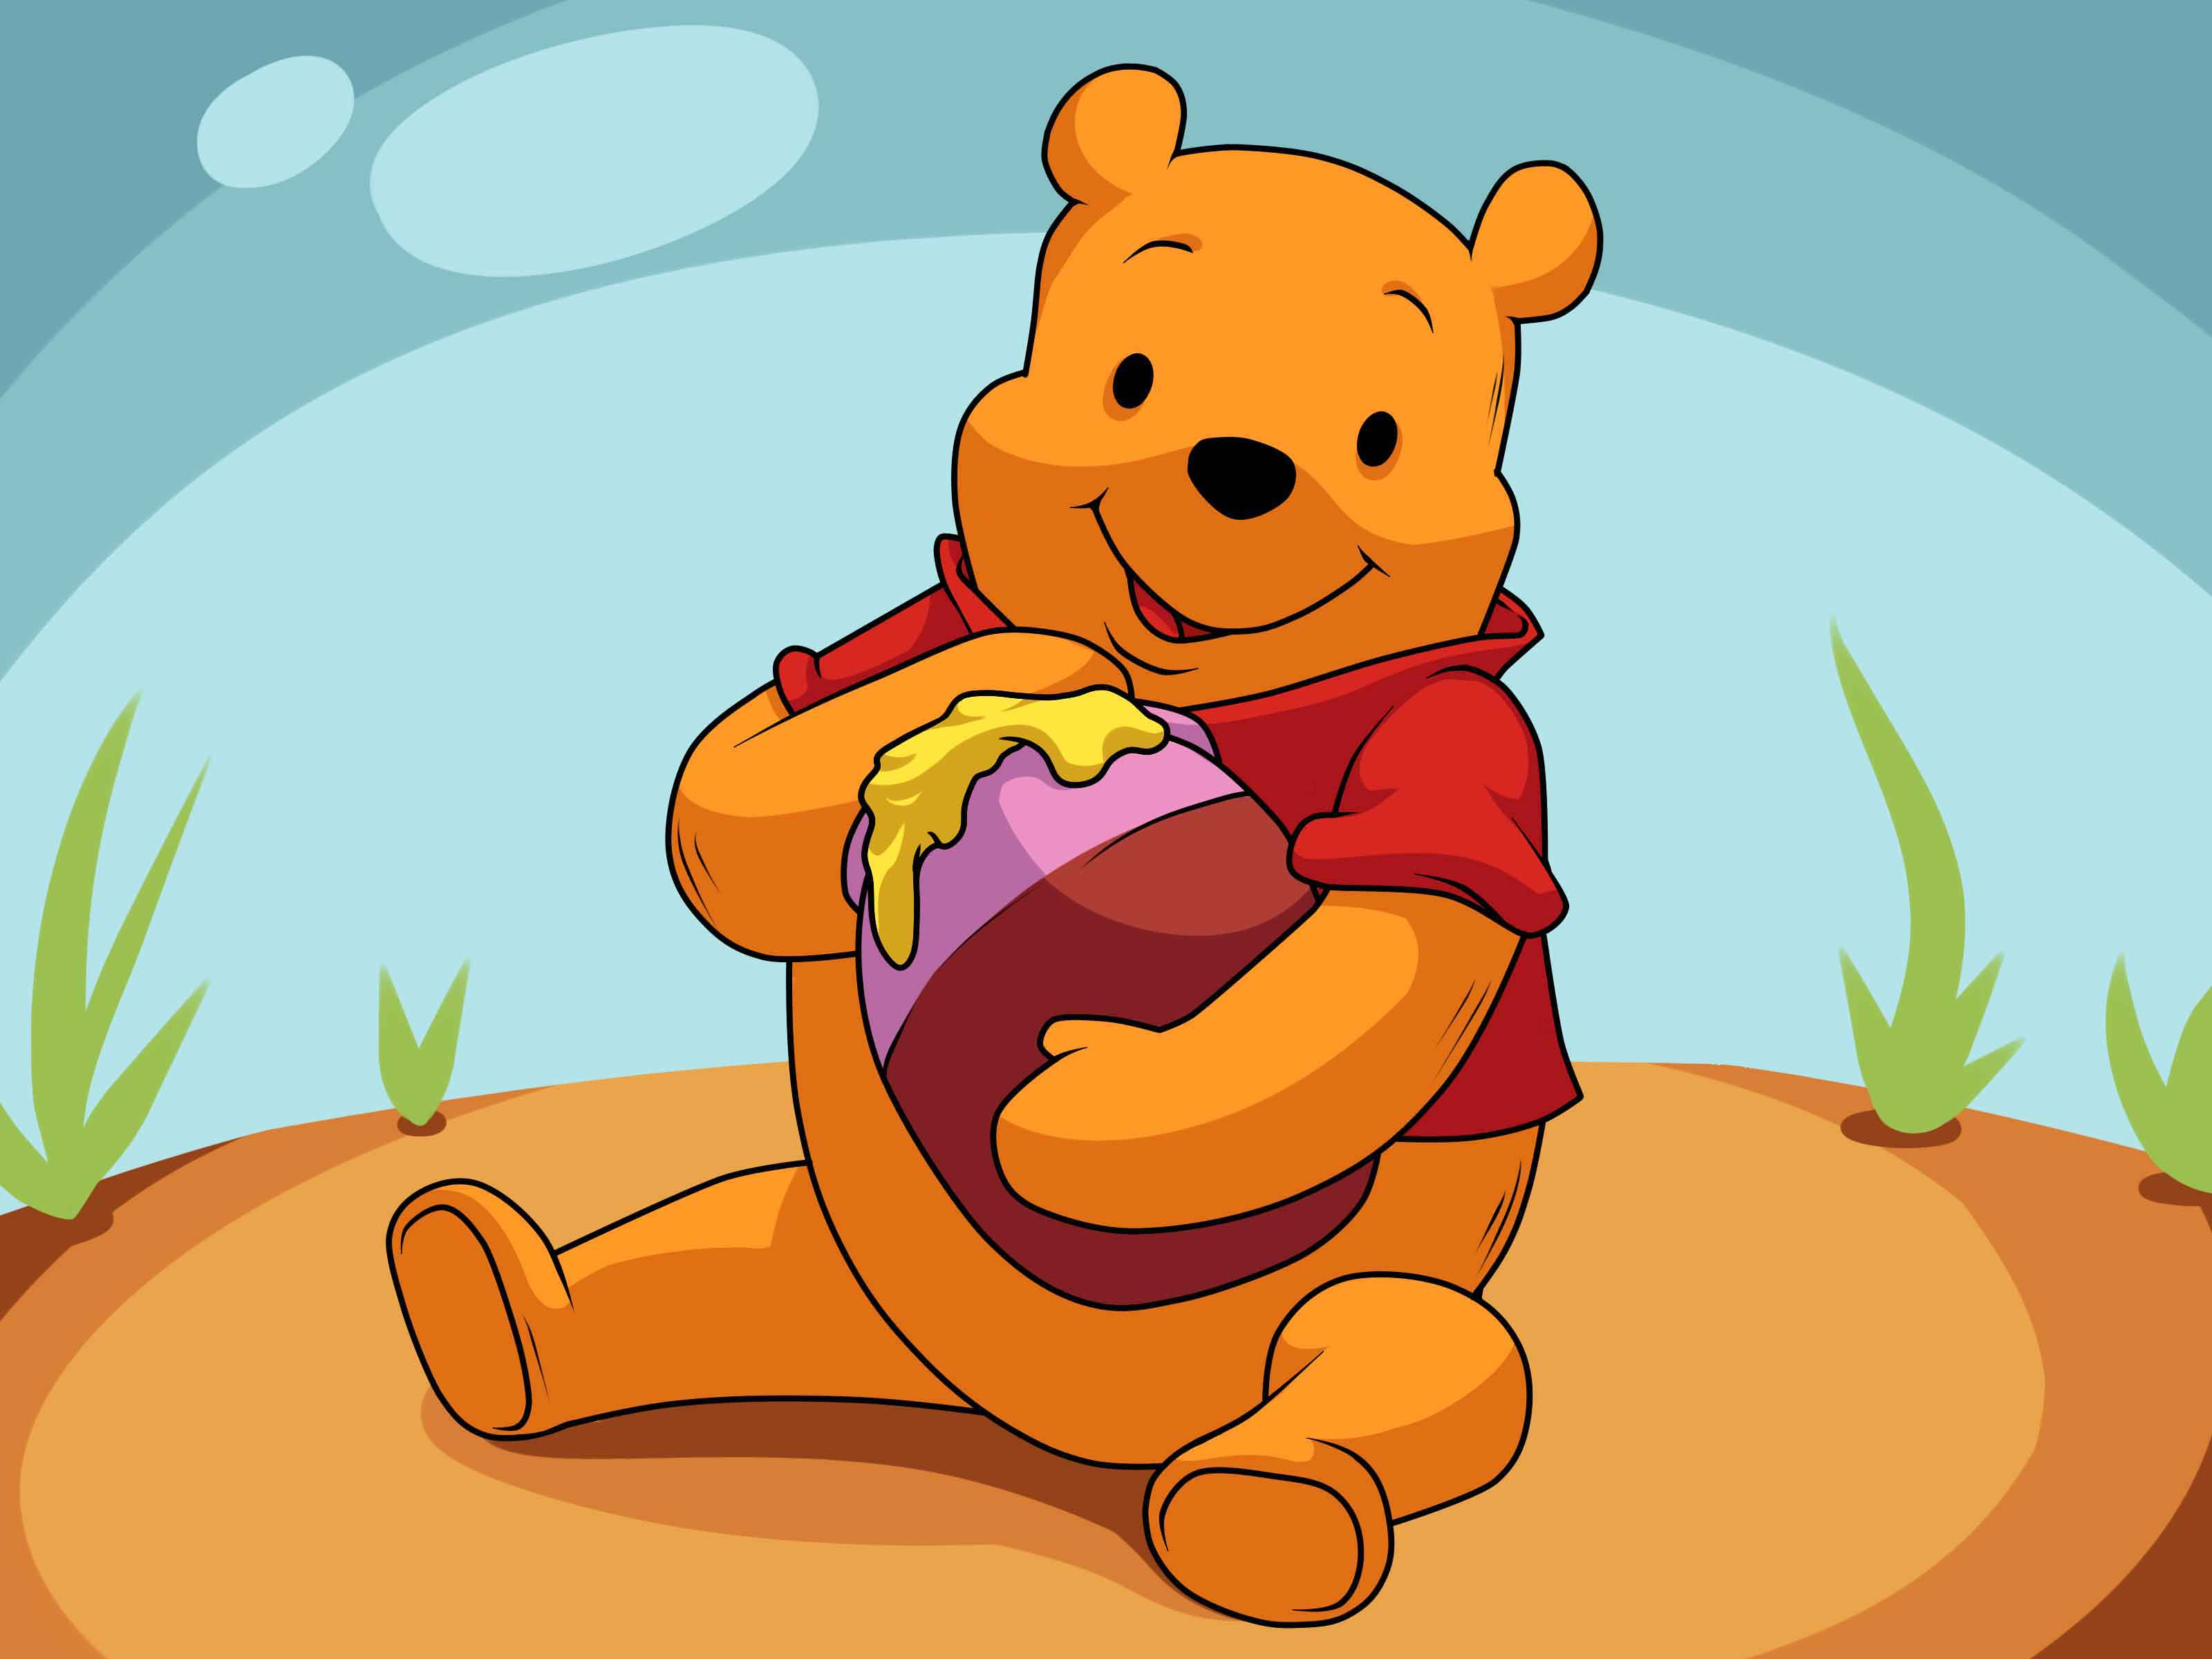 Winnie The Pooh wallpapers, Cartoon, HQ Winnie The Pooh ...